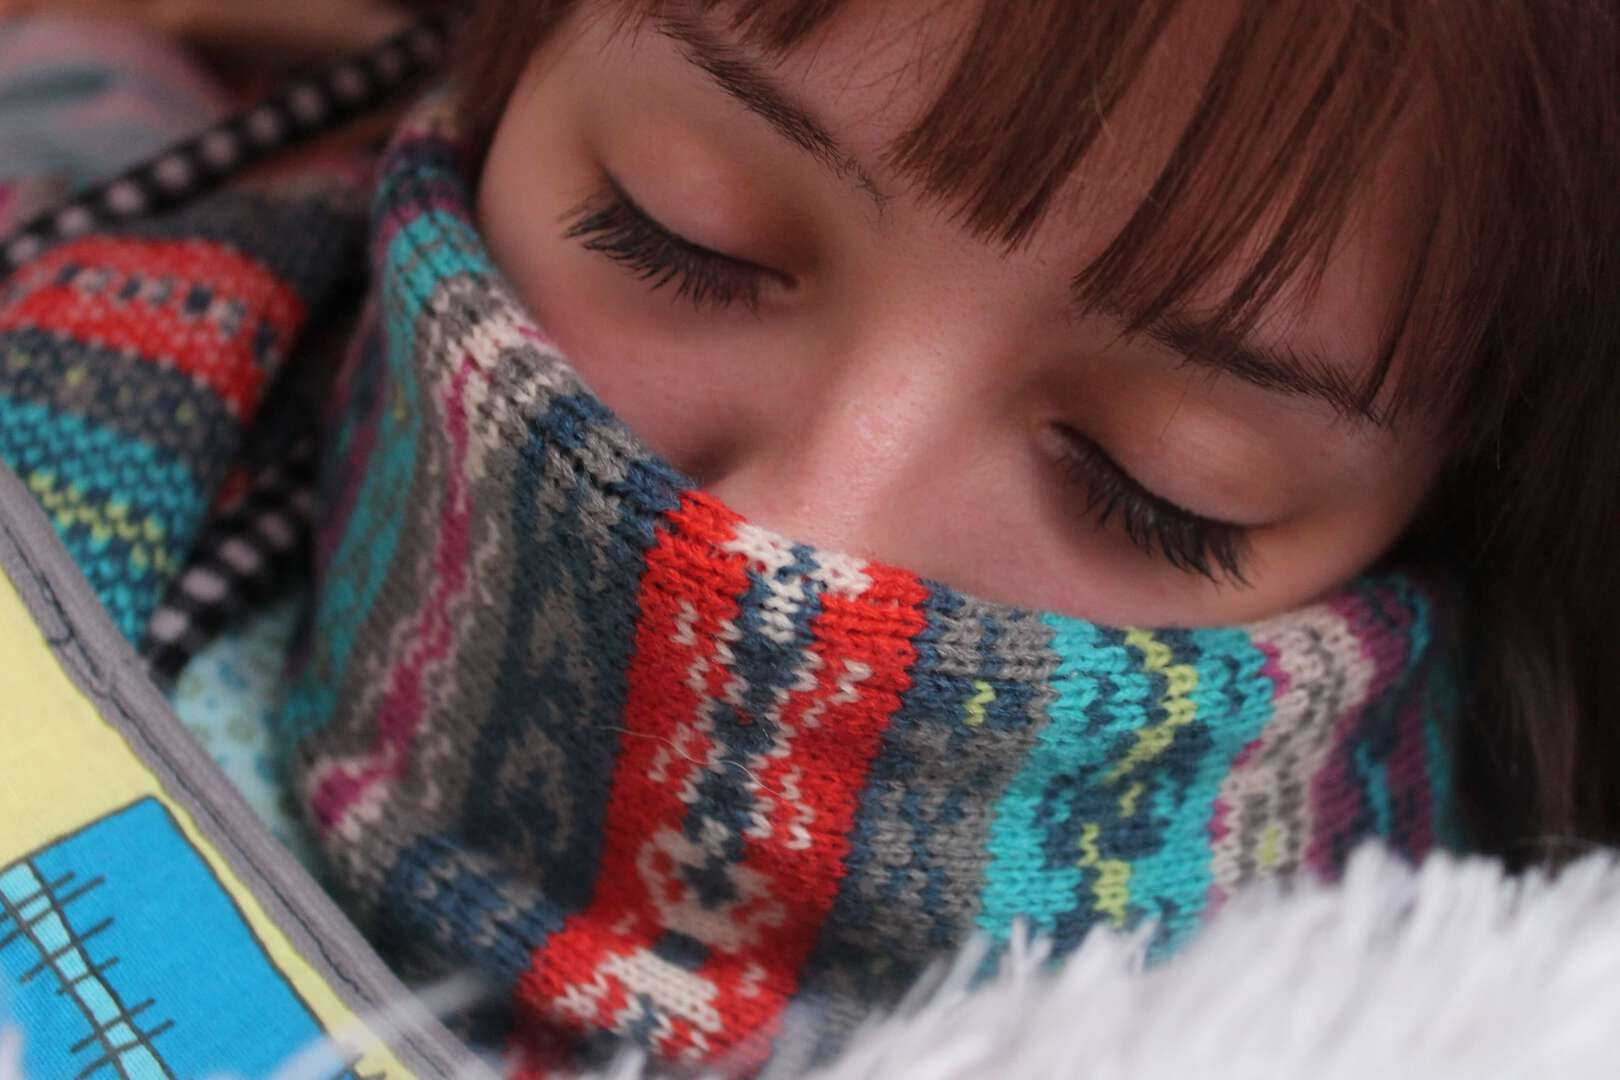 Top 5 Flu Myths